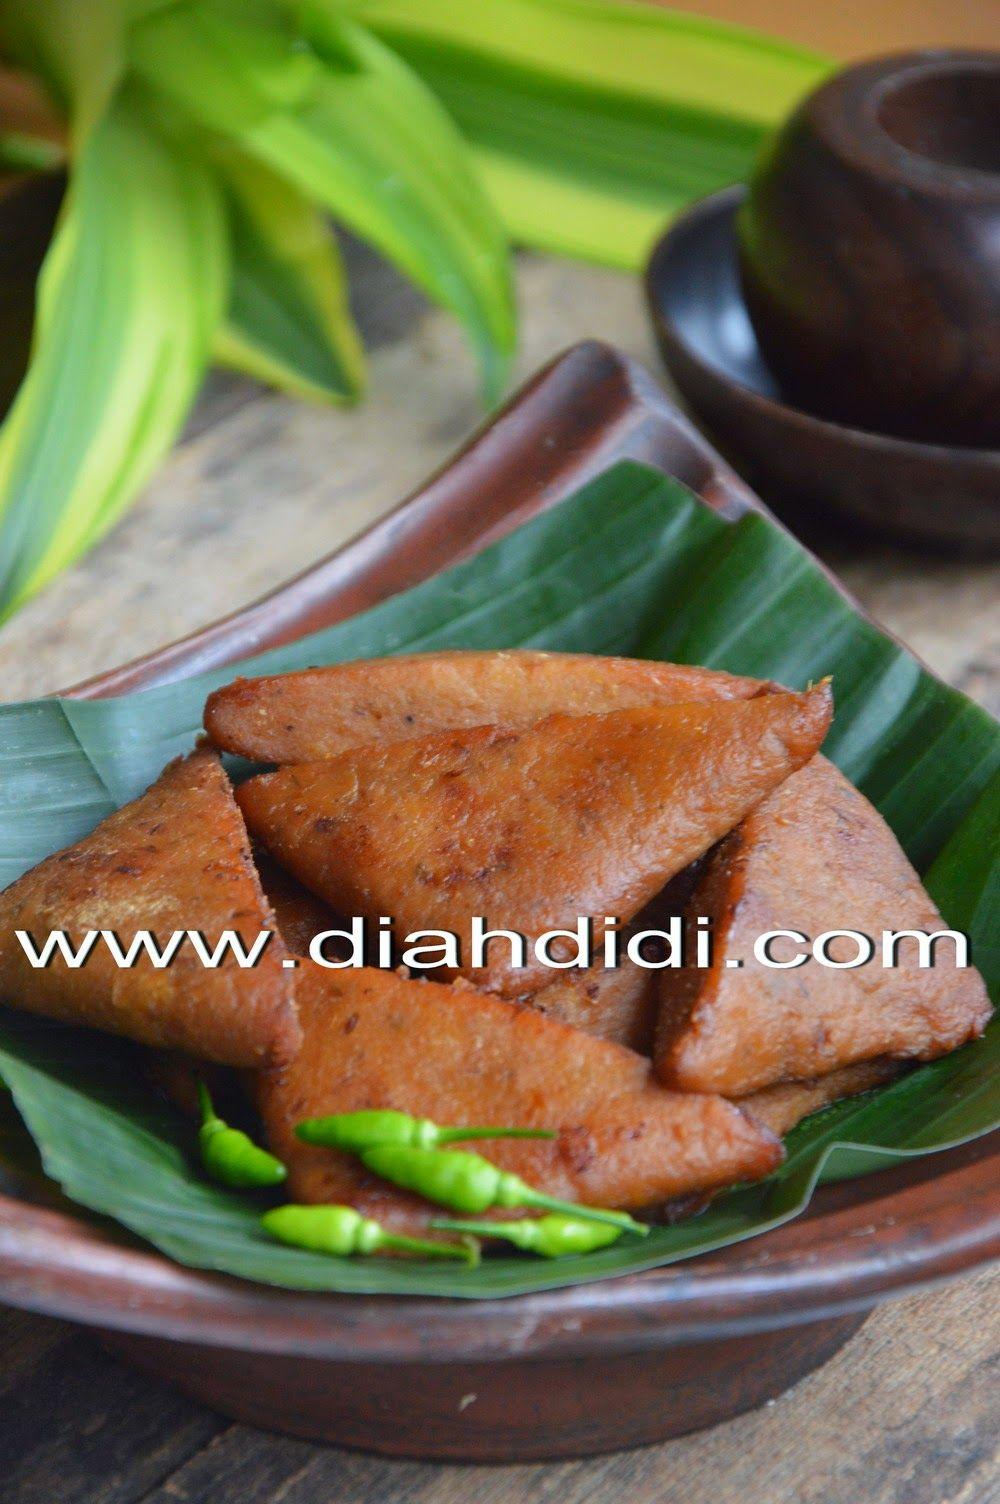 Diah Didi S Kitchen Gembus Bacem Resep Masakan Indonesia Resep Makanan India Makanan